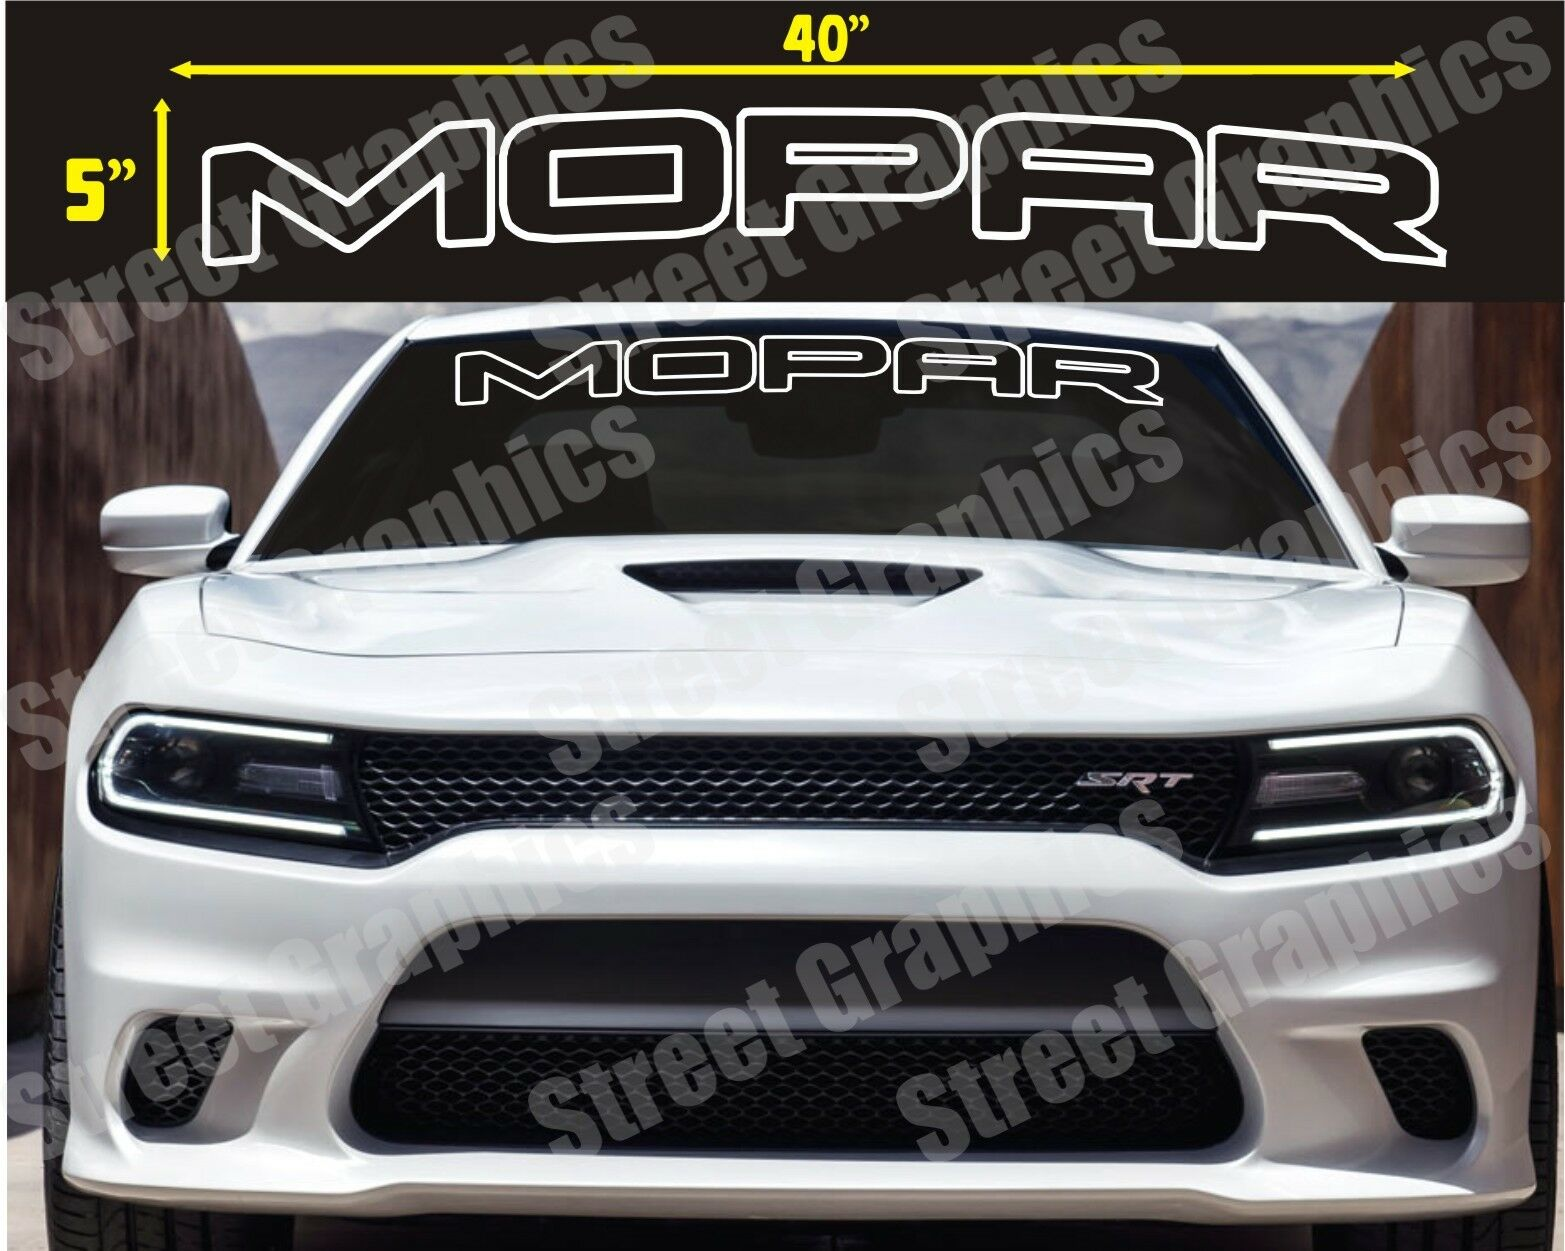 MOPAR TOP WINDSHIELD VINYL DECAL STICKER BANNER CHARGER RAM ETC CHALLENGER